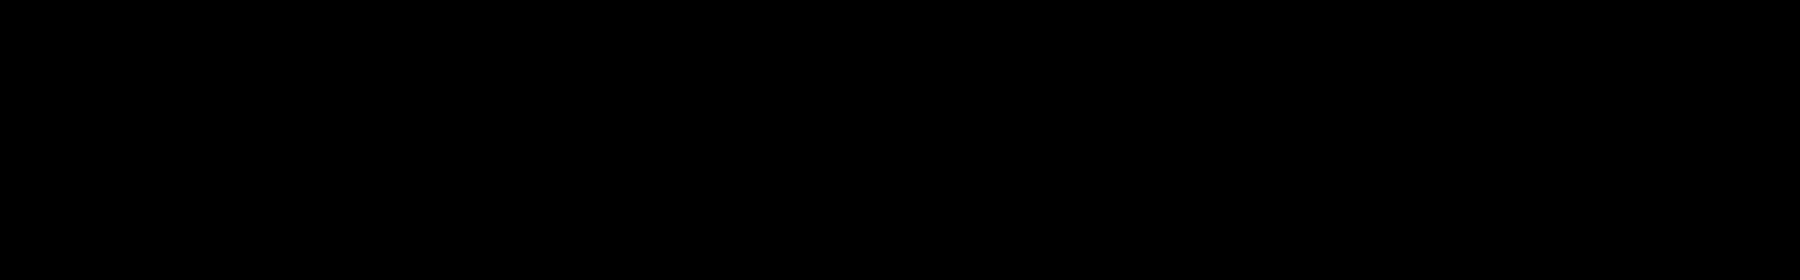 Black Forest audio waveform